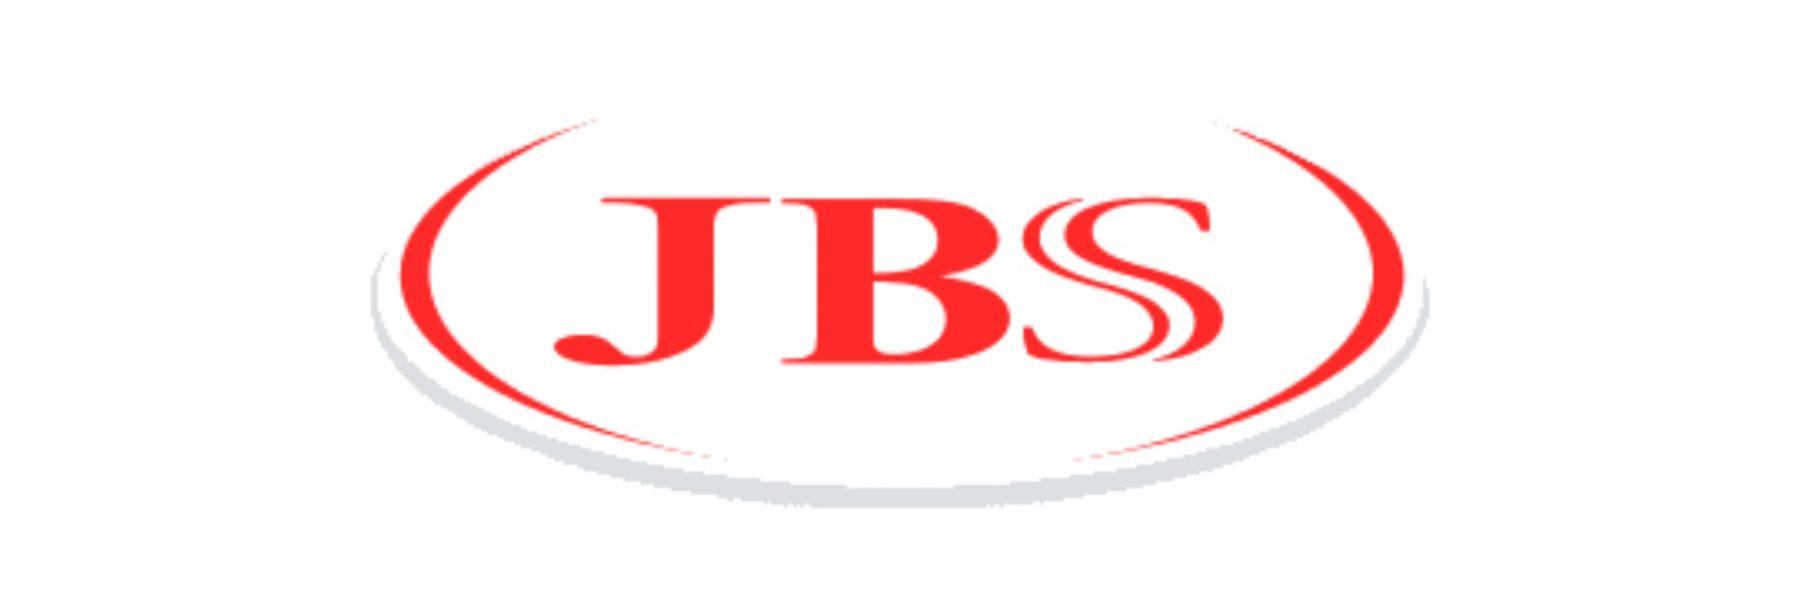 JBS Telefone - 0800 - Ouvidoria